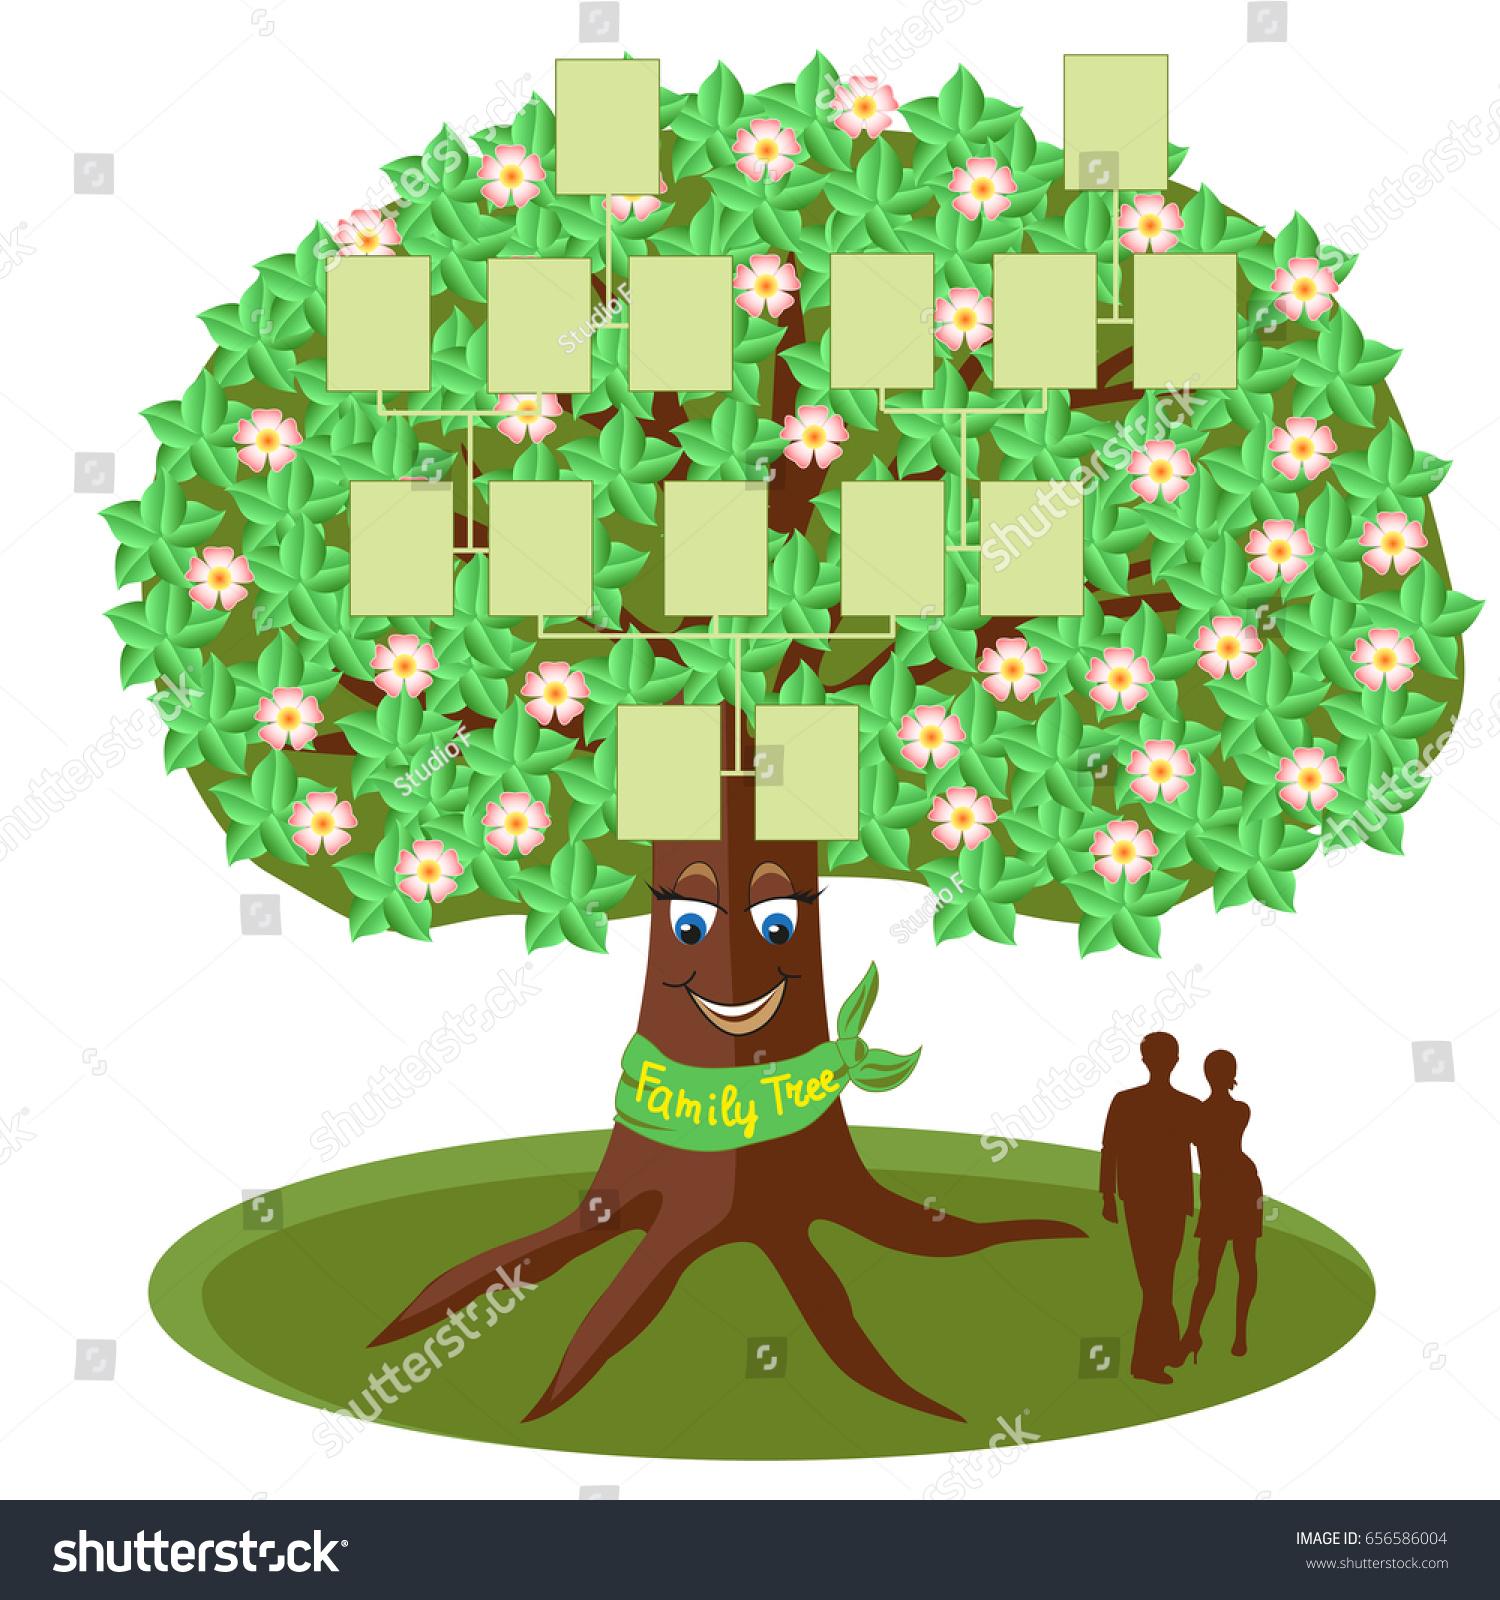 Family Tree Template Empty Frames Photos Stock Vector Royalty Free